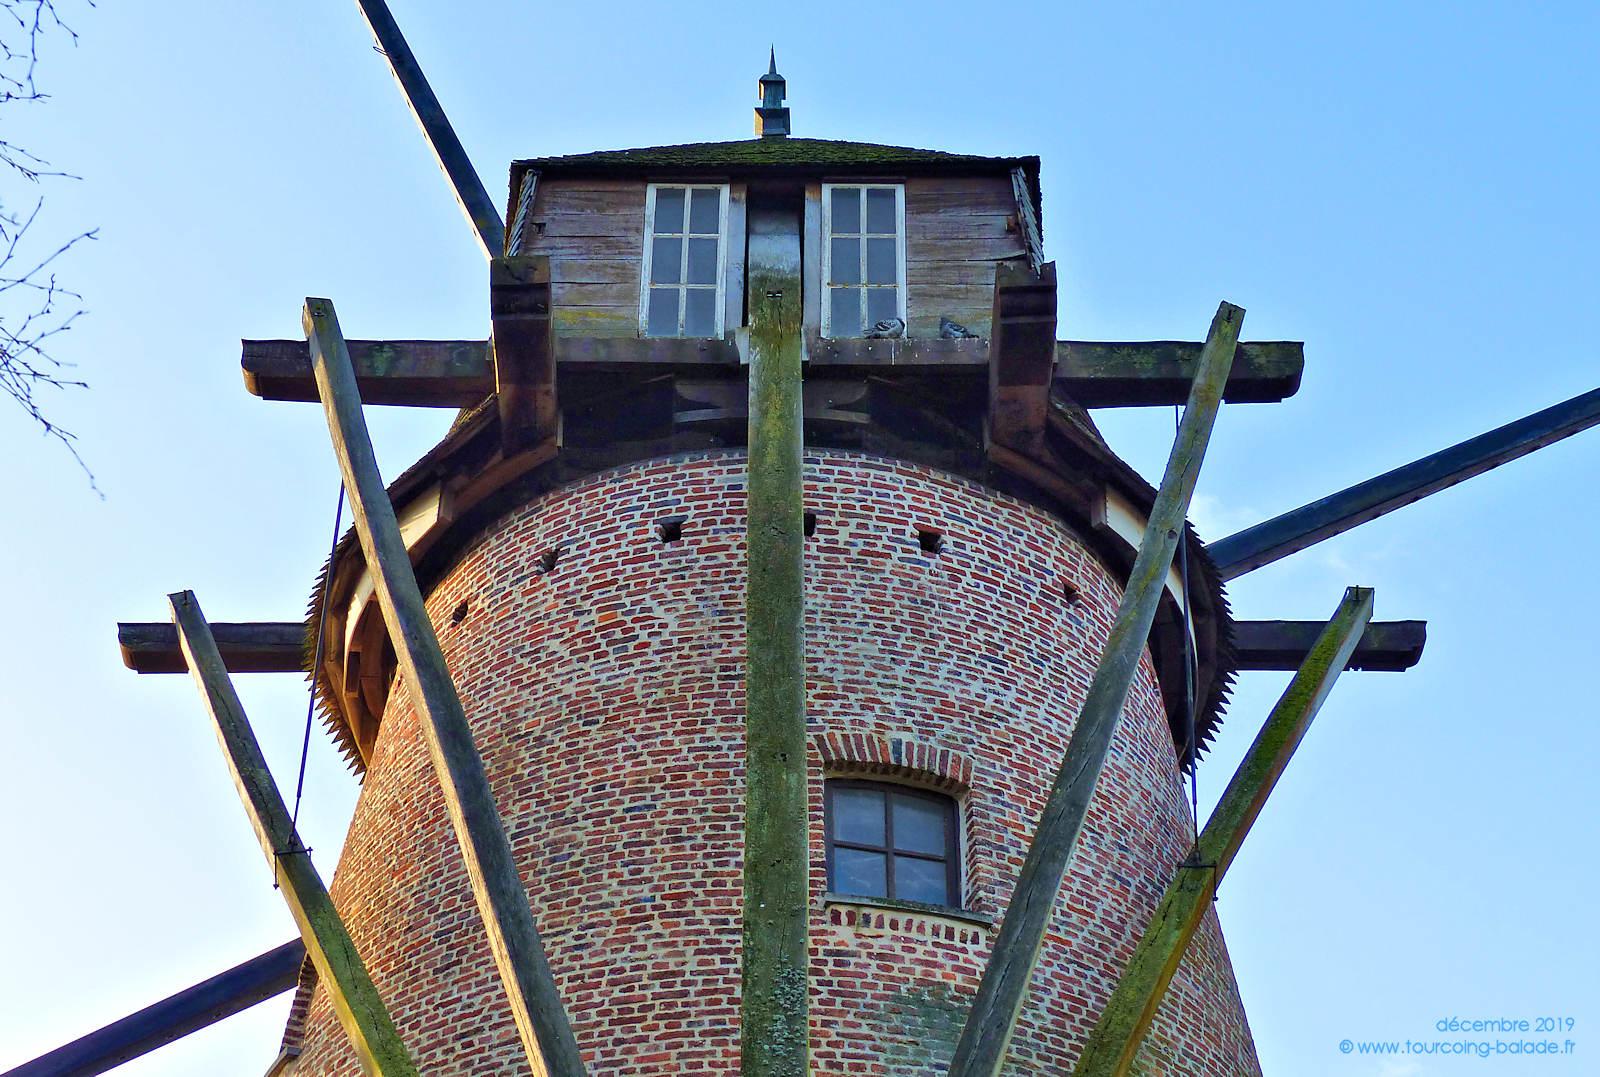 Calotte du Moulin Hollebeke, Halluin.